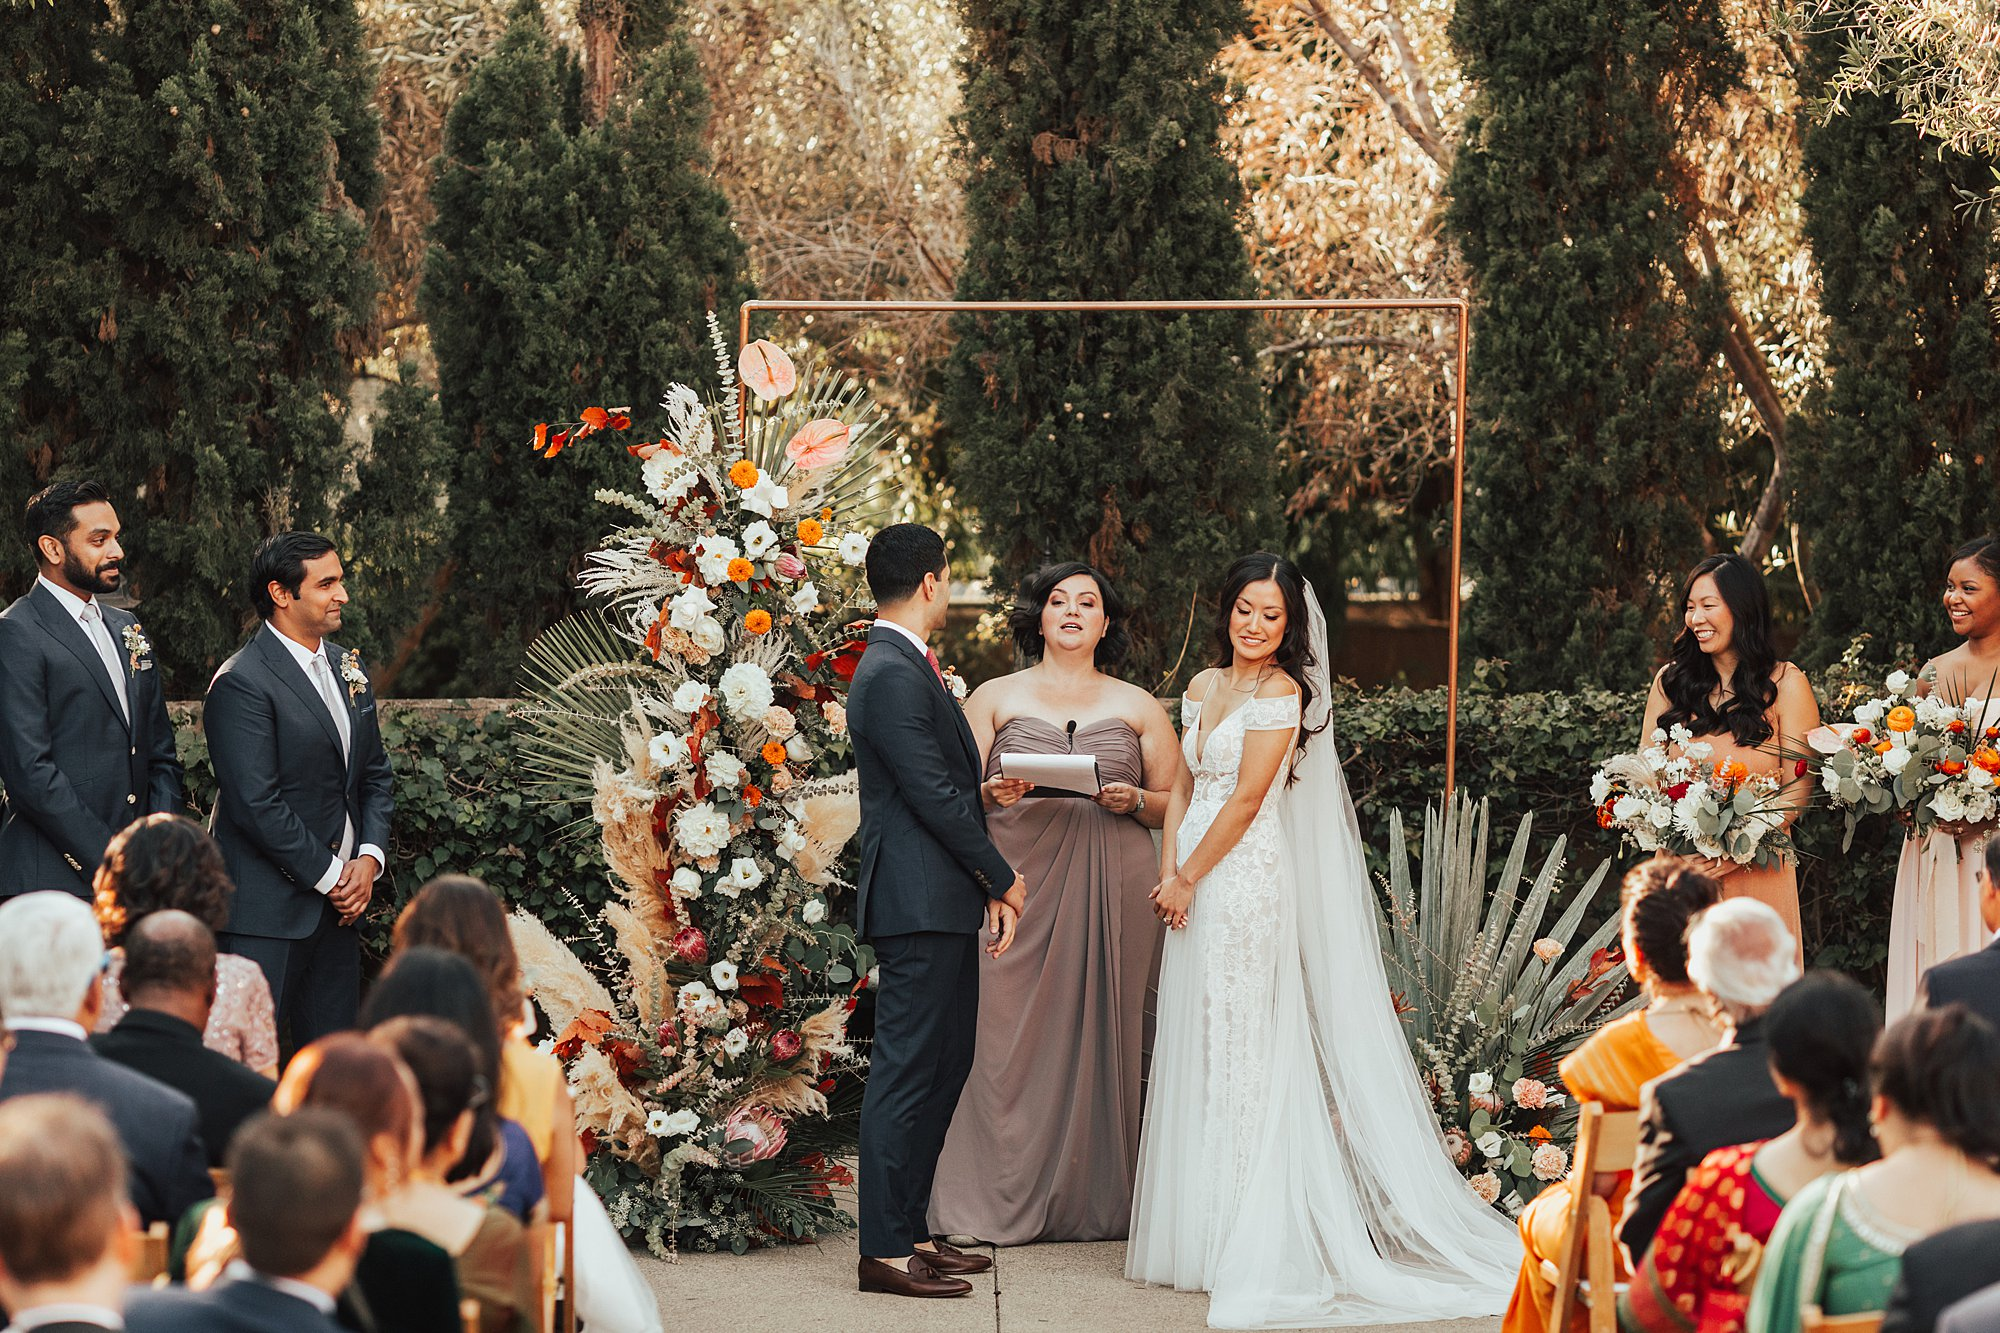 Ceremony at Estancia La jolla